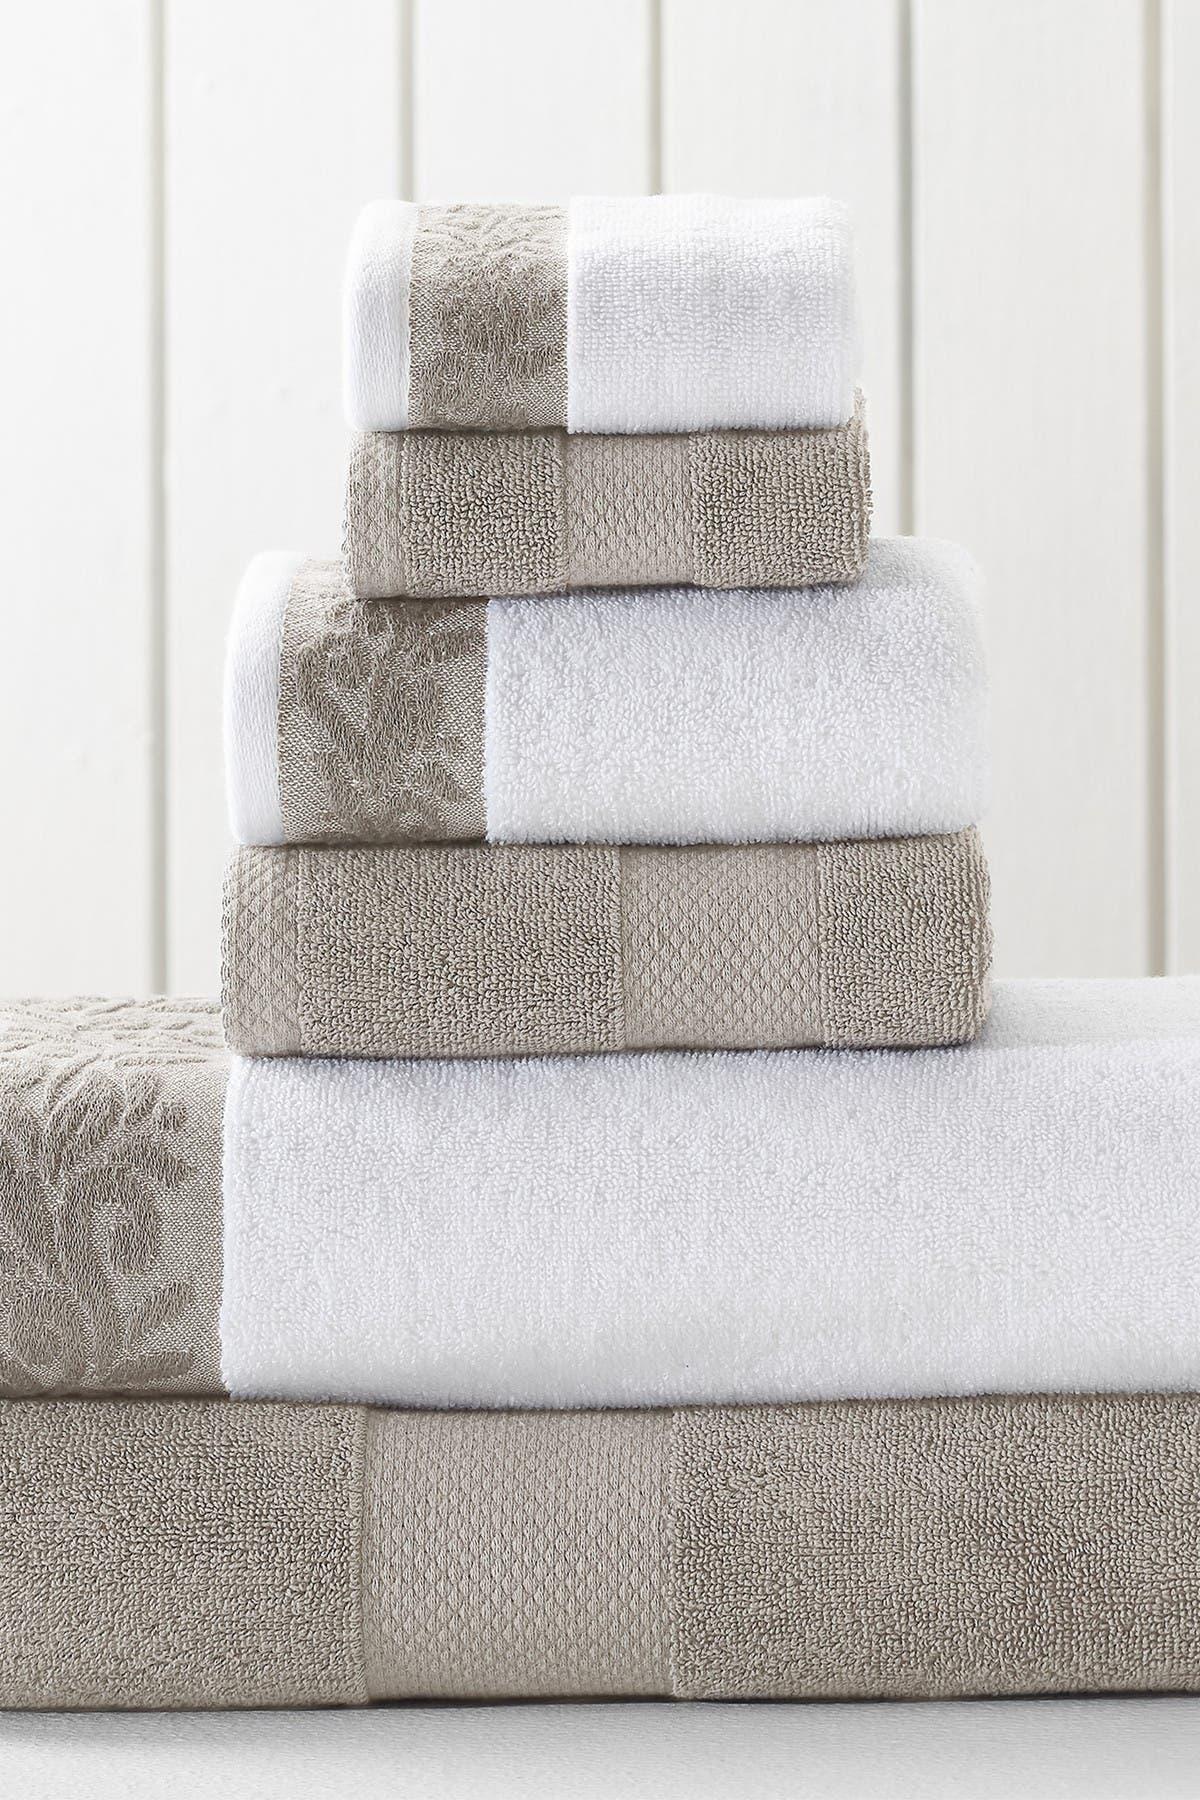 Image of Modern Threads Filgree Jacquard Border Towel 6-Piece Set - Flax